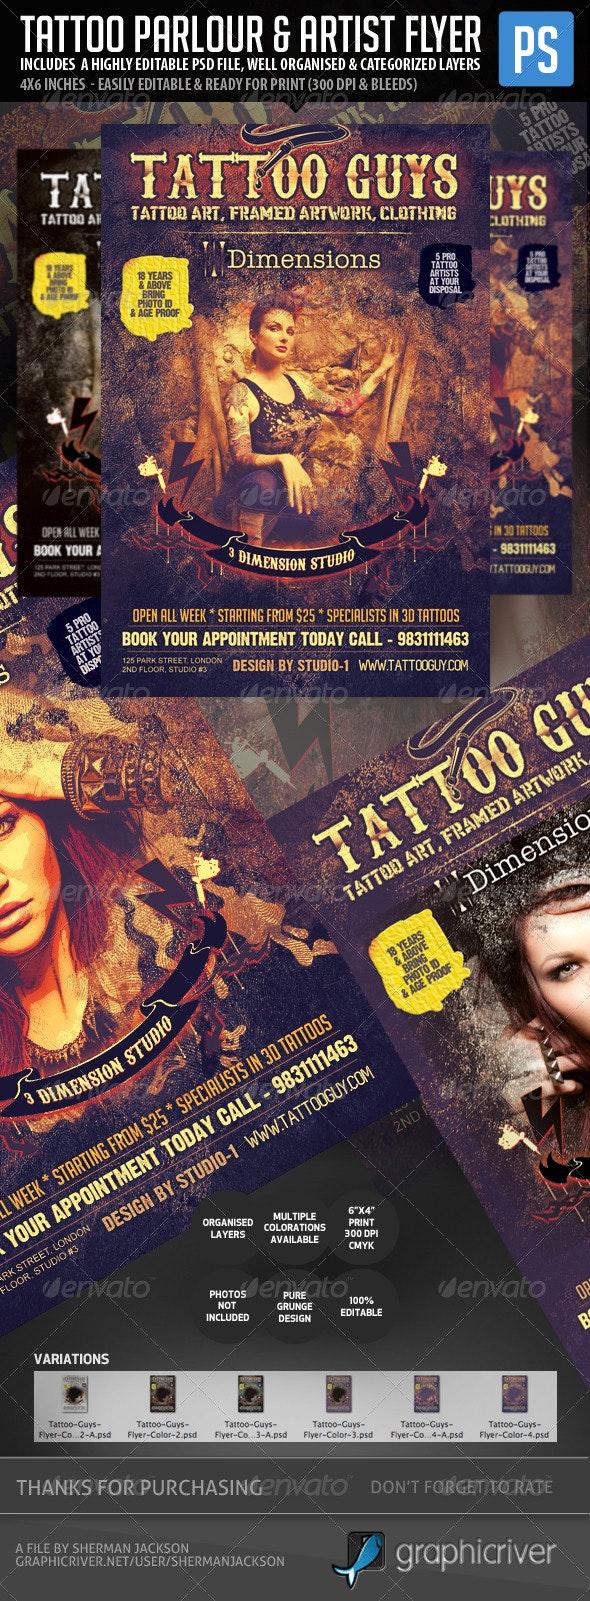 Tattoo Artist & Tattoo Parlour Flyer - Miscellaneous Events